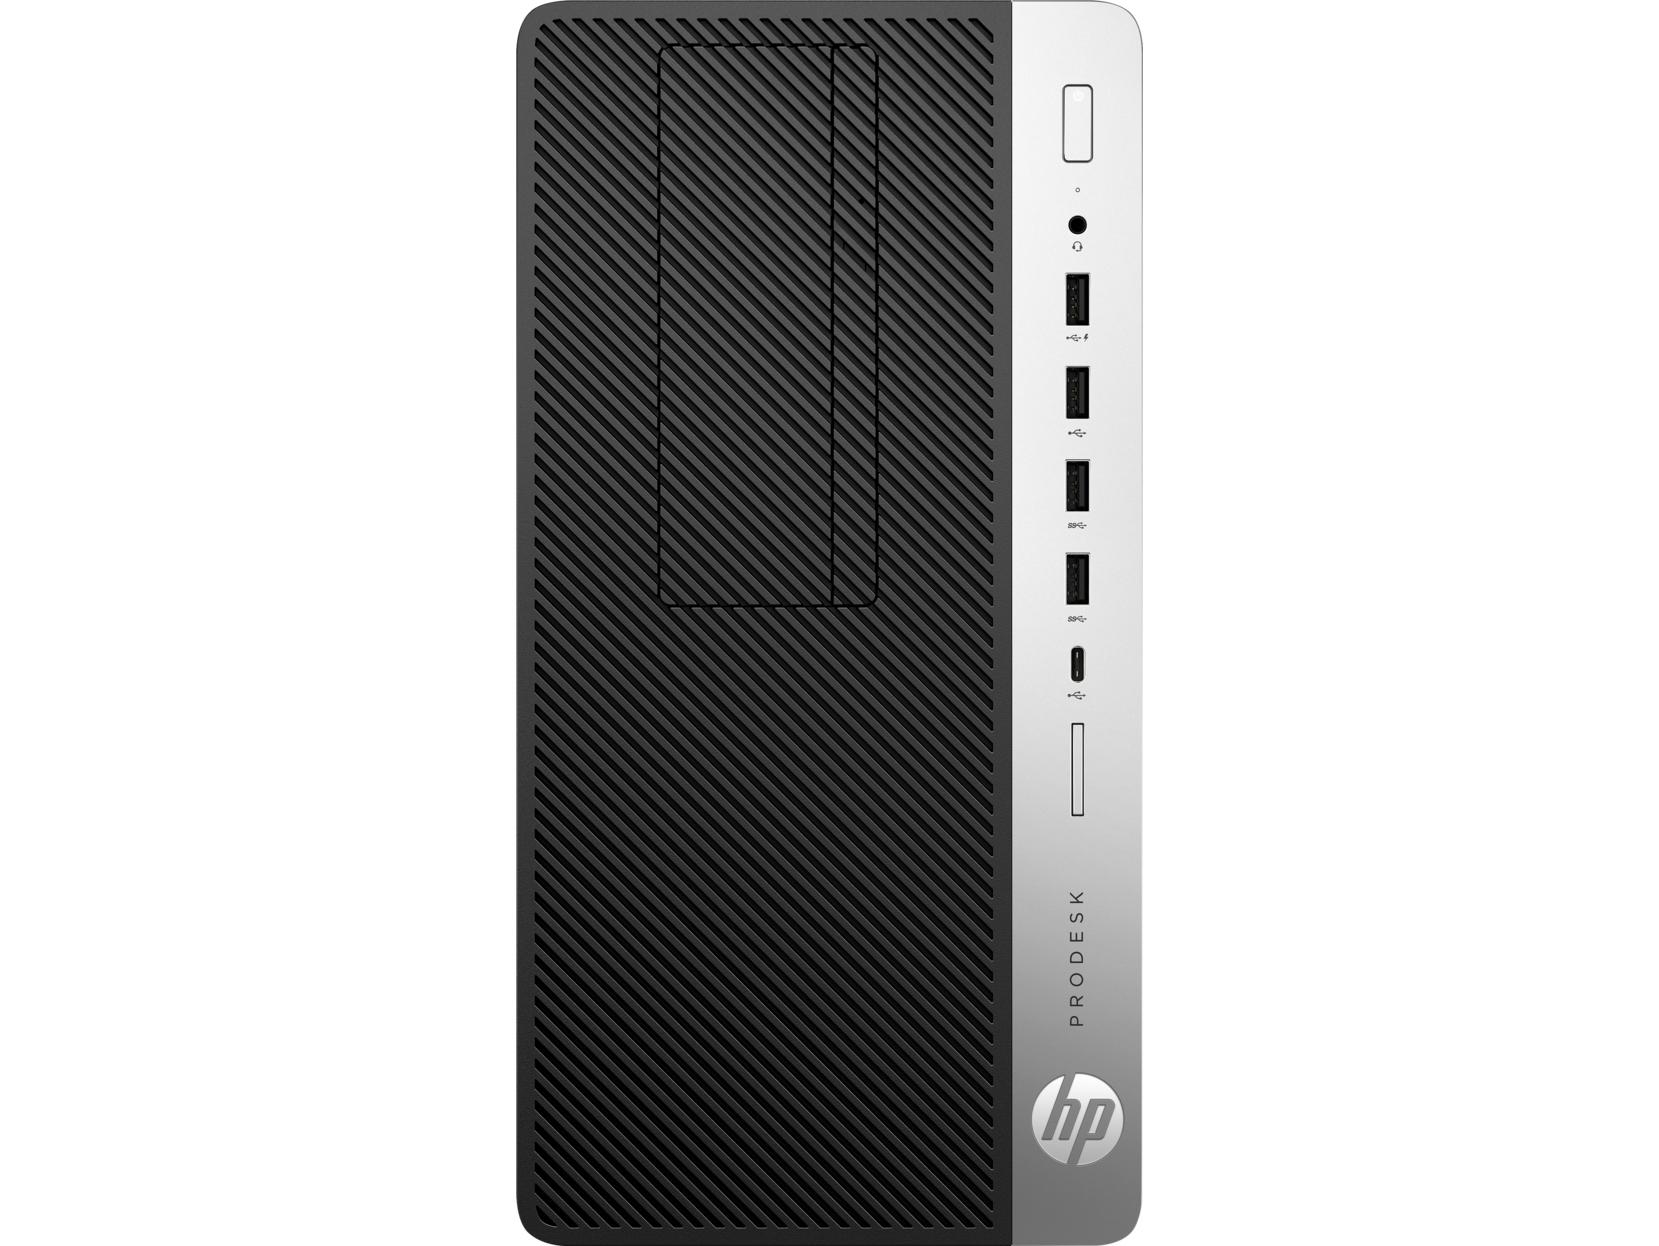 ProDesk 600 G3 - Micro tower - 1 x Core i5 7500 / 3.4 GHz - RAM 8 GB - SSD 256 GB - NVMe TLC - DVD-Writer - HD Graphics 630 - GigE - Win 10 Pro 64-bit - vPro - monitor: none - keyboard: US